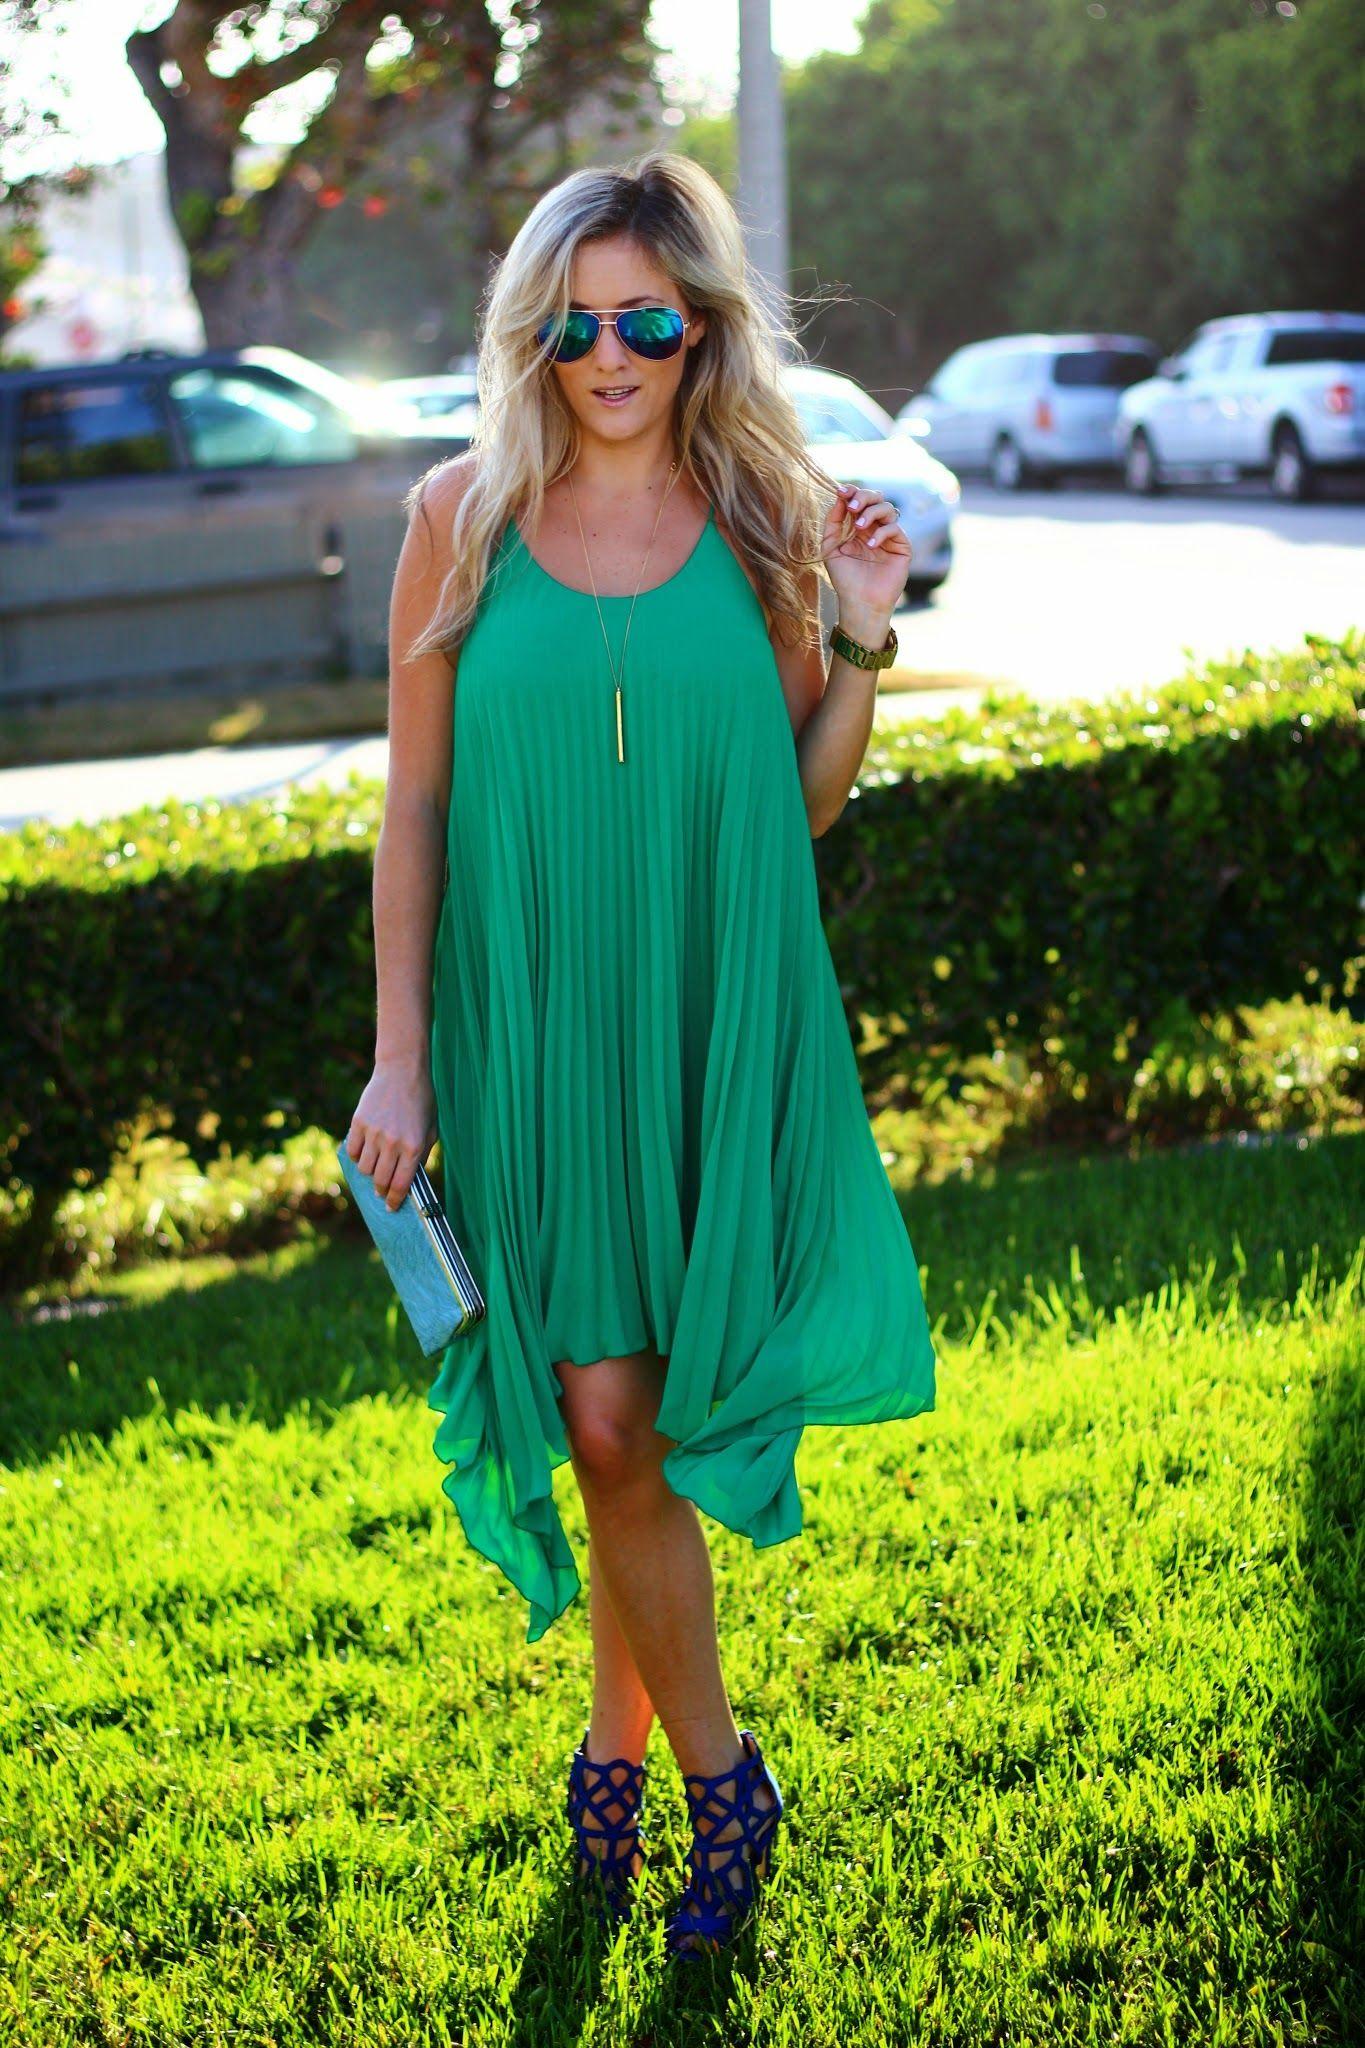 Wedding Guest Attire Pleated Green Dress Outdoor